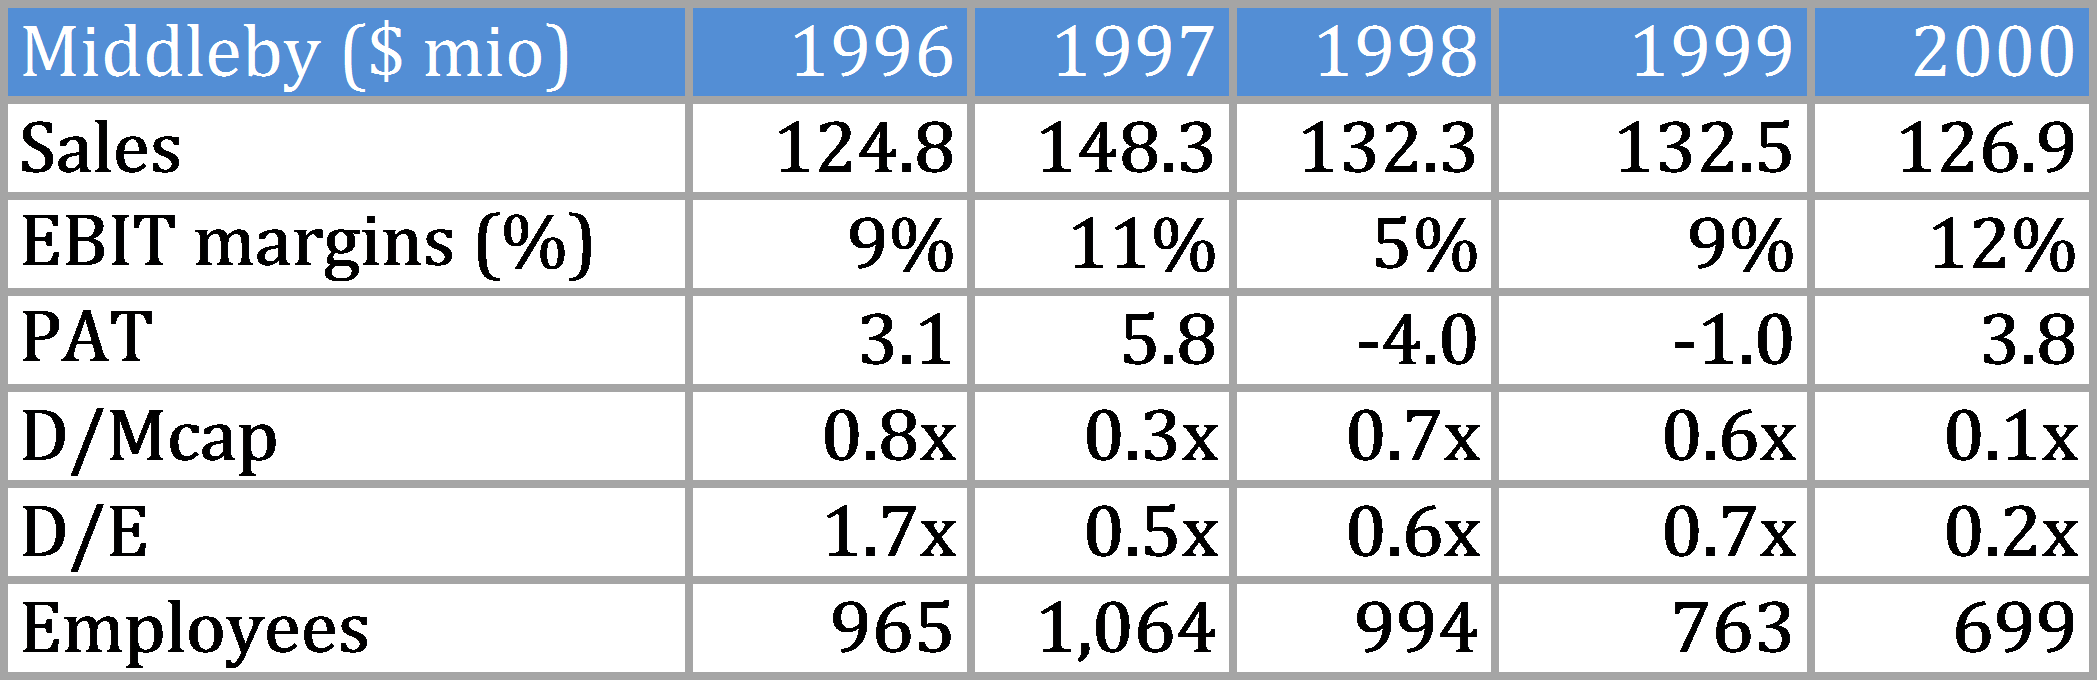 MIDD Performance 1996 - 2000